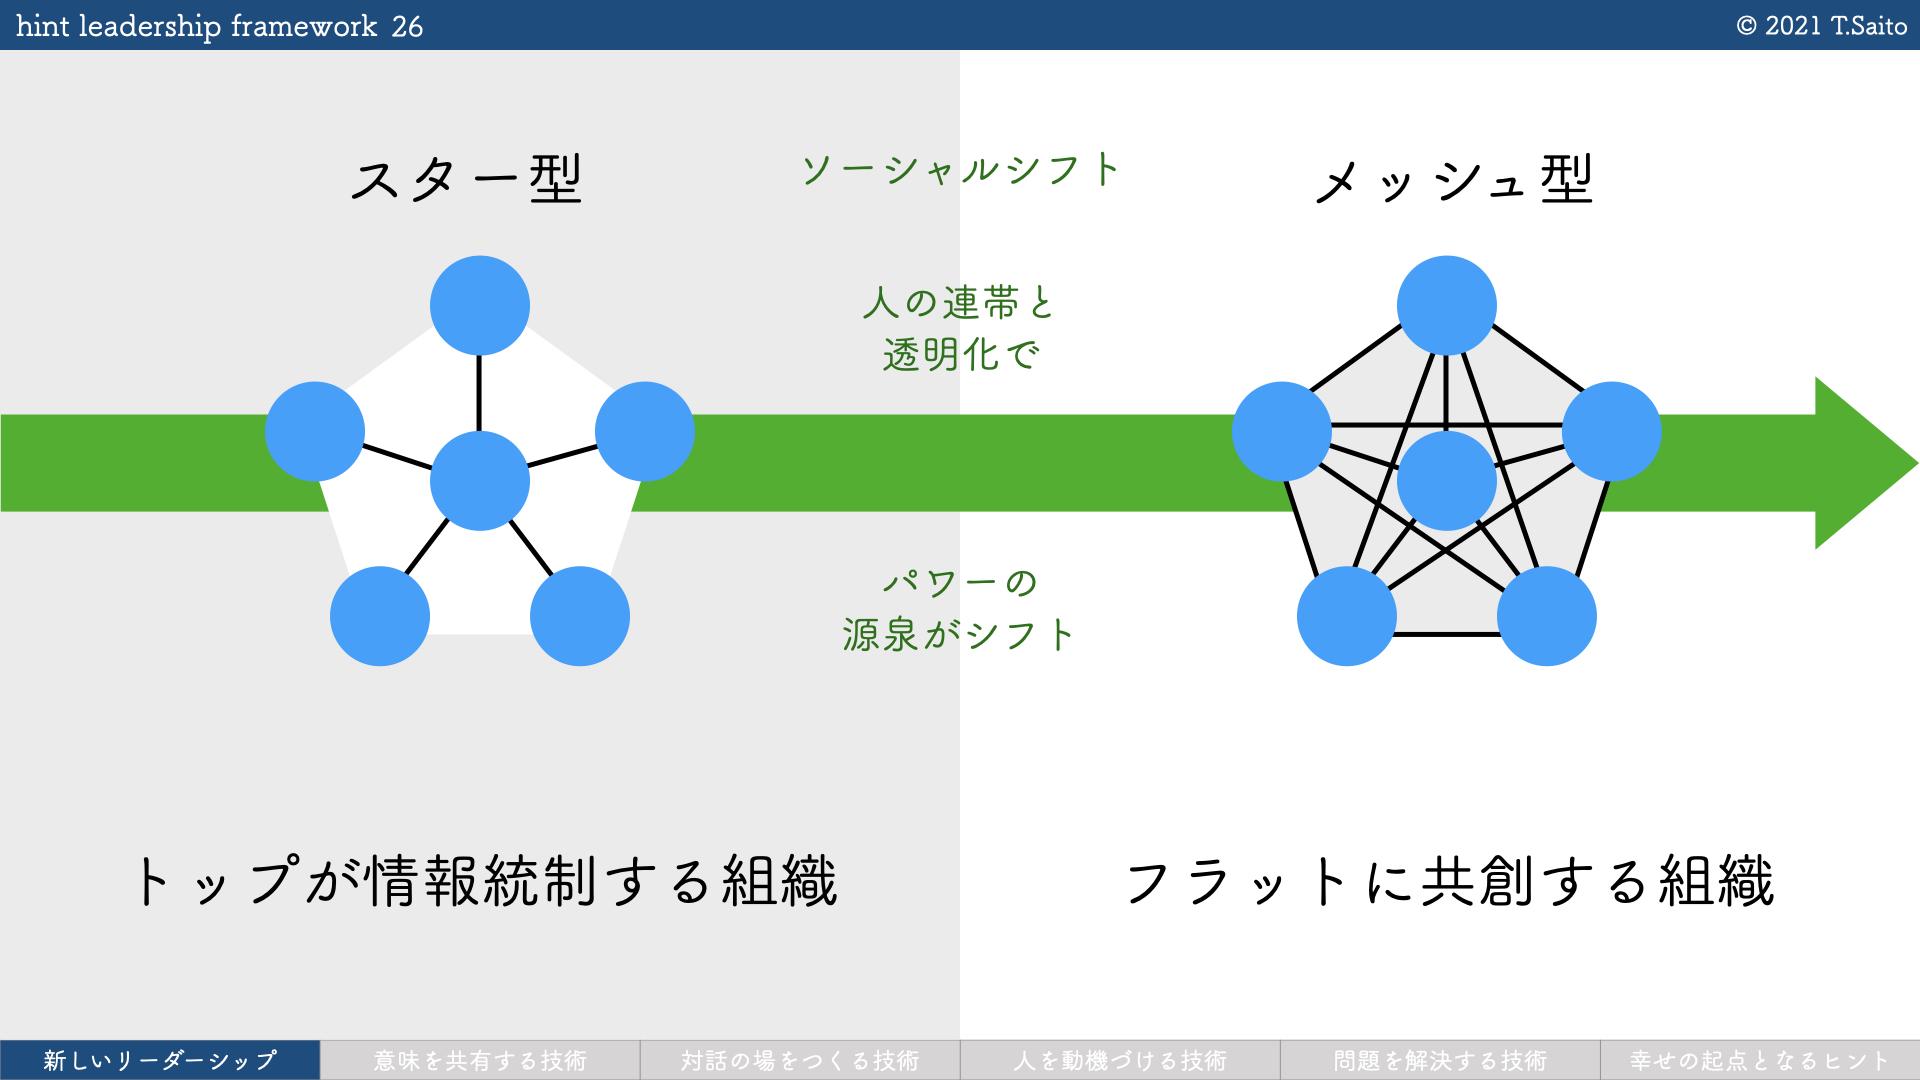 hint leadership framework 1.0.1.026